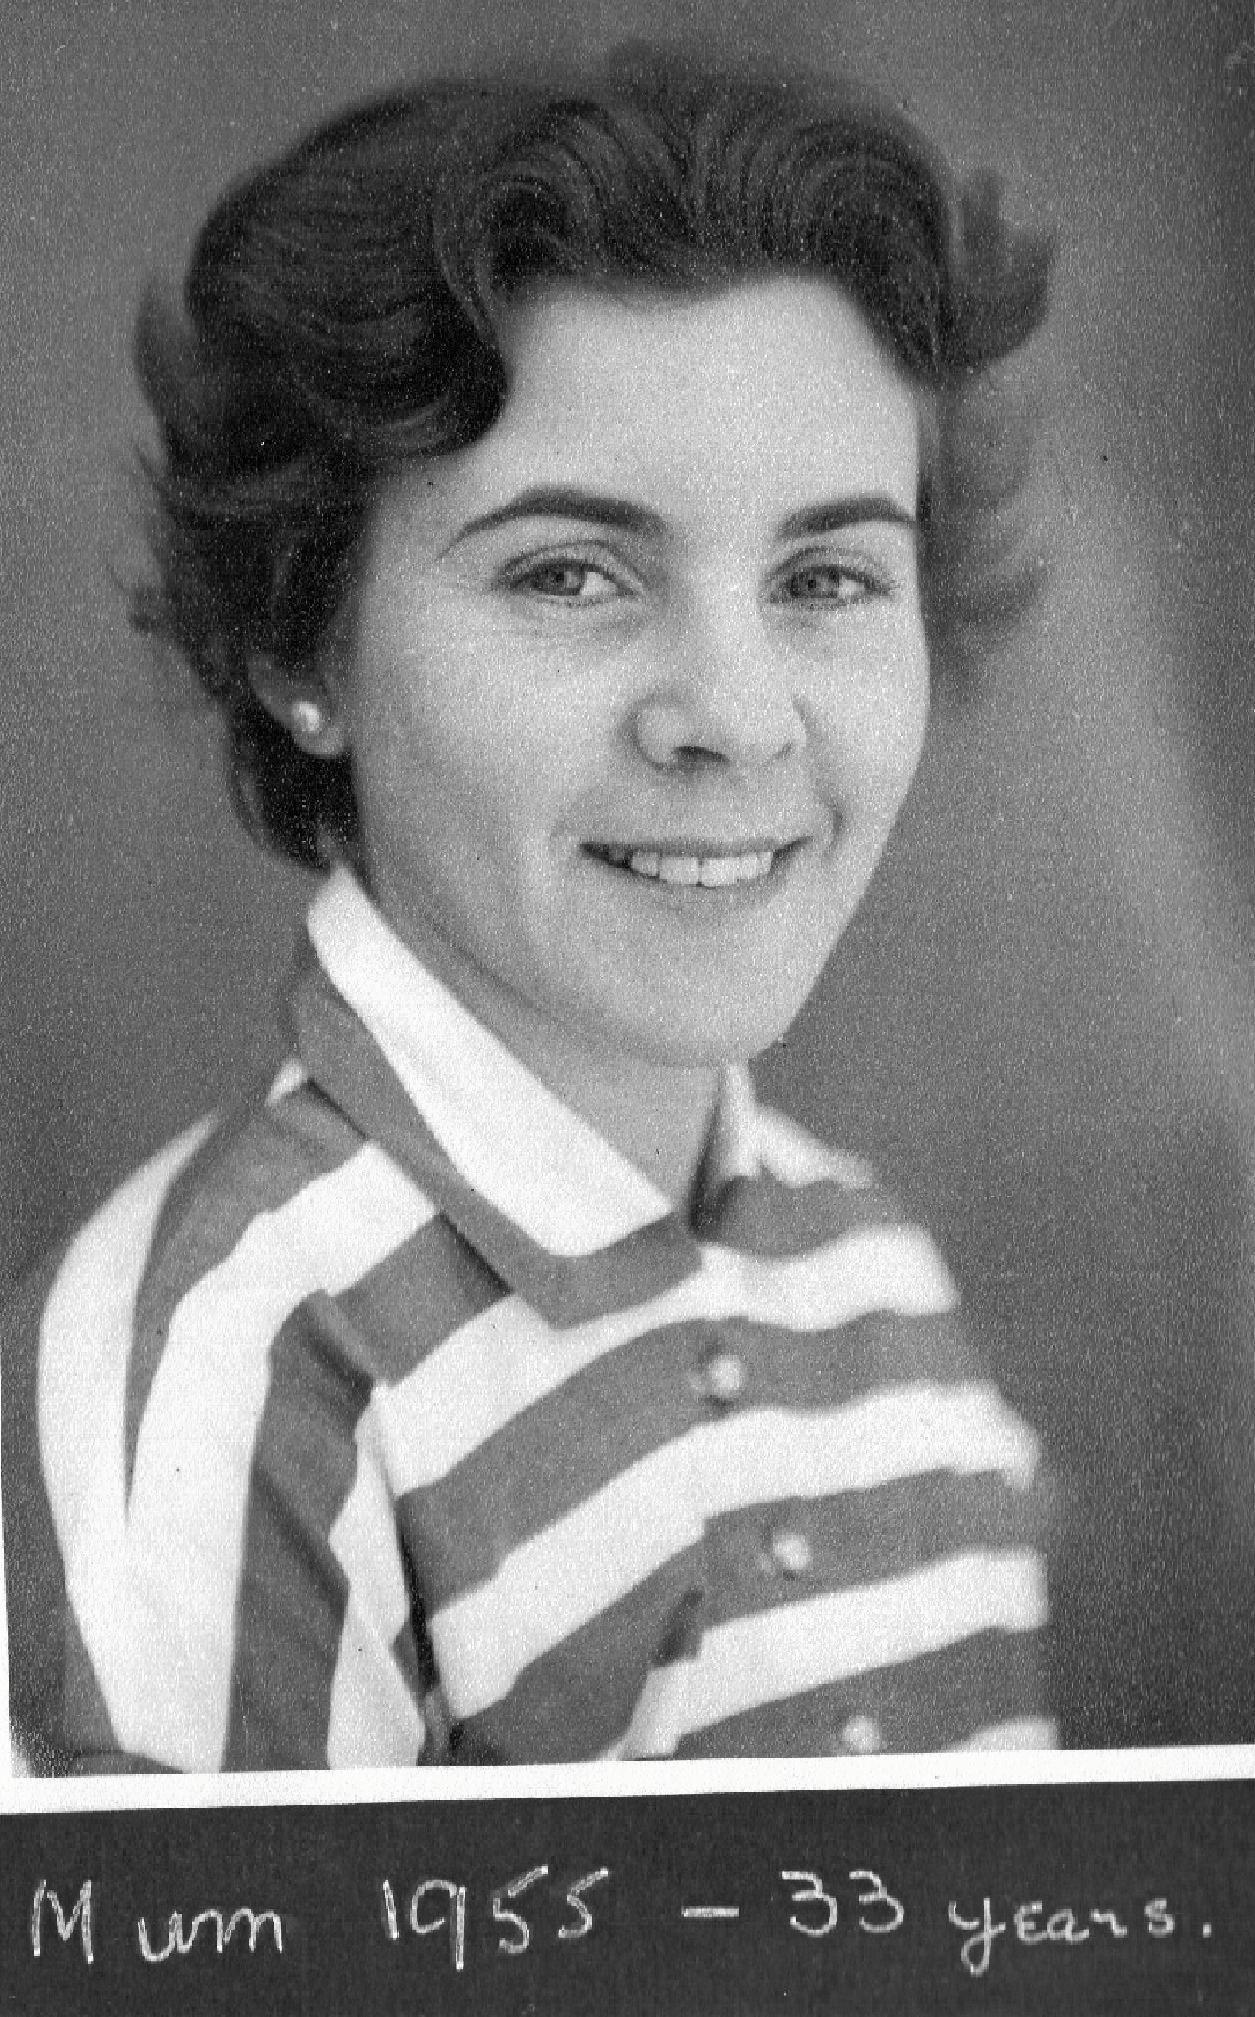 Eileen in 1955, aged 33.